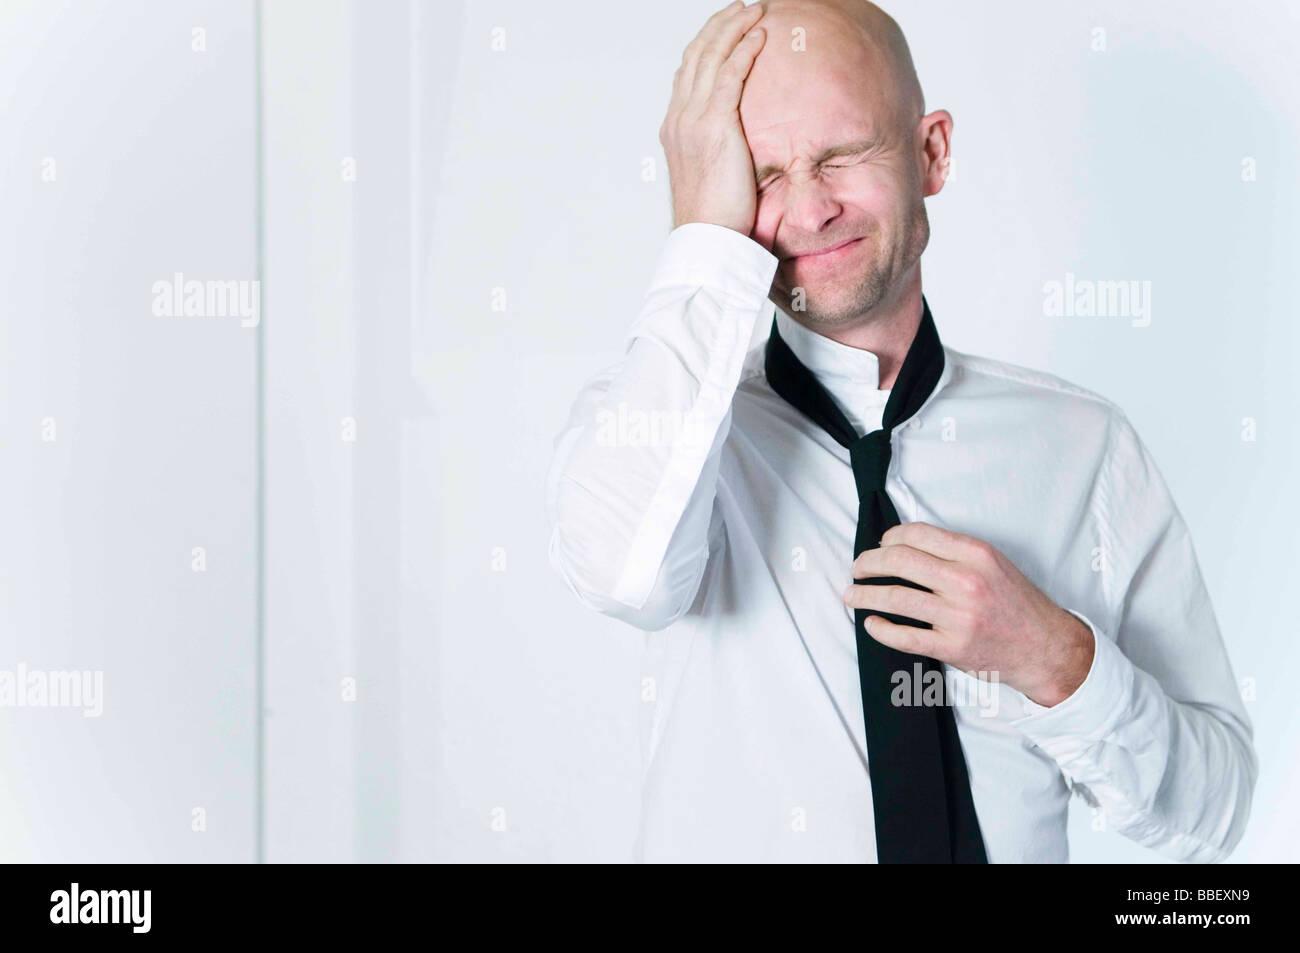 Businessman loosening his tie - Stock Image